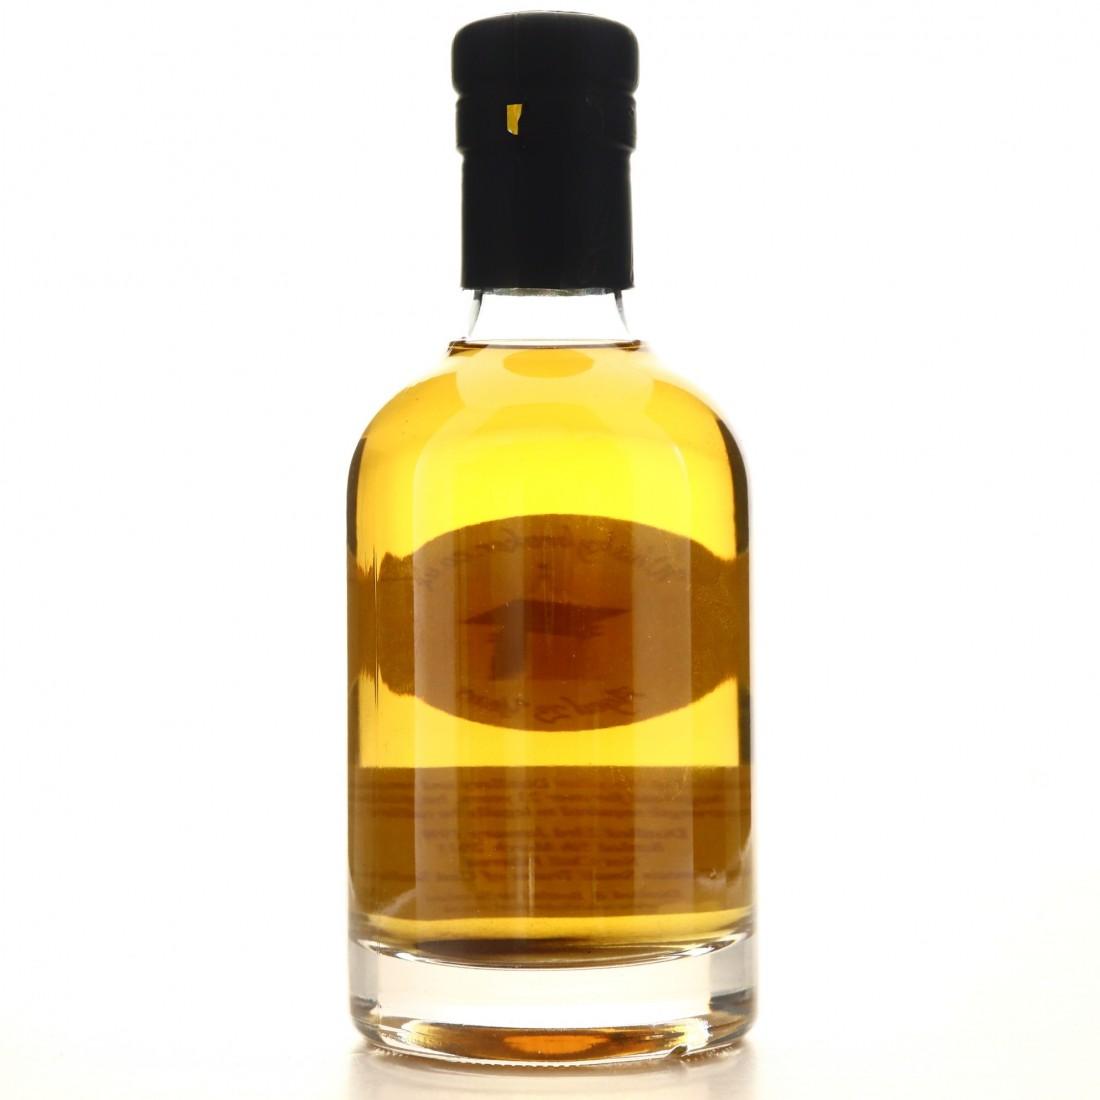 Macallan 1990 Whisky Broker 23 Year Old Single Malt Spirit 20cl